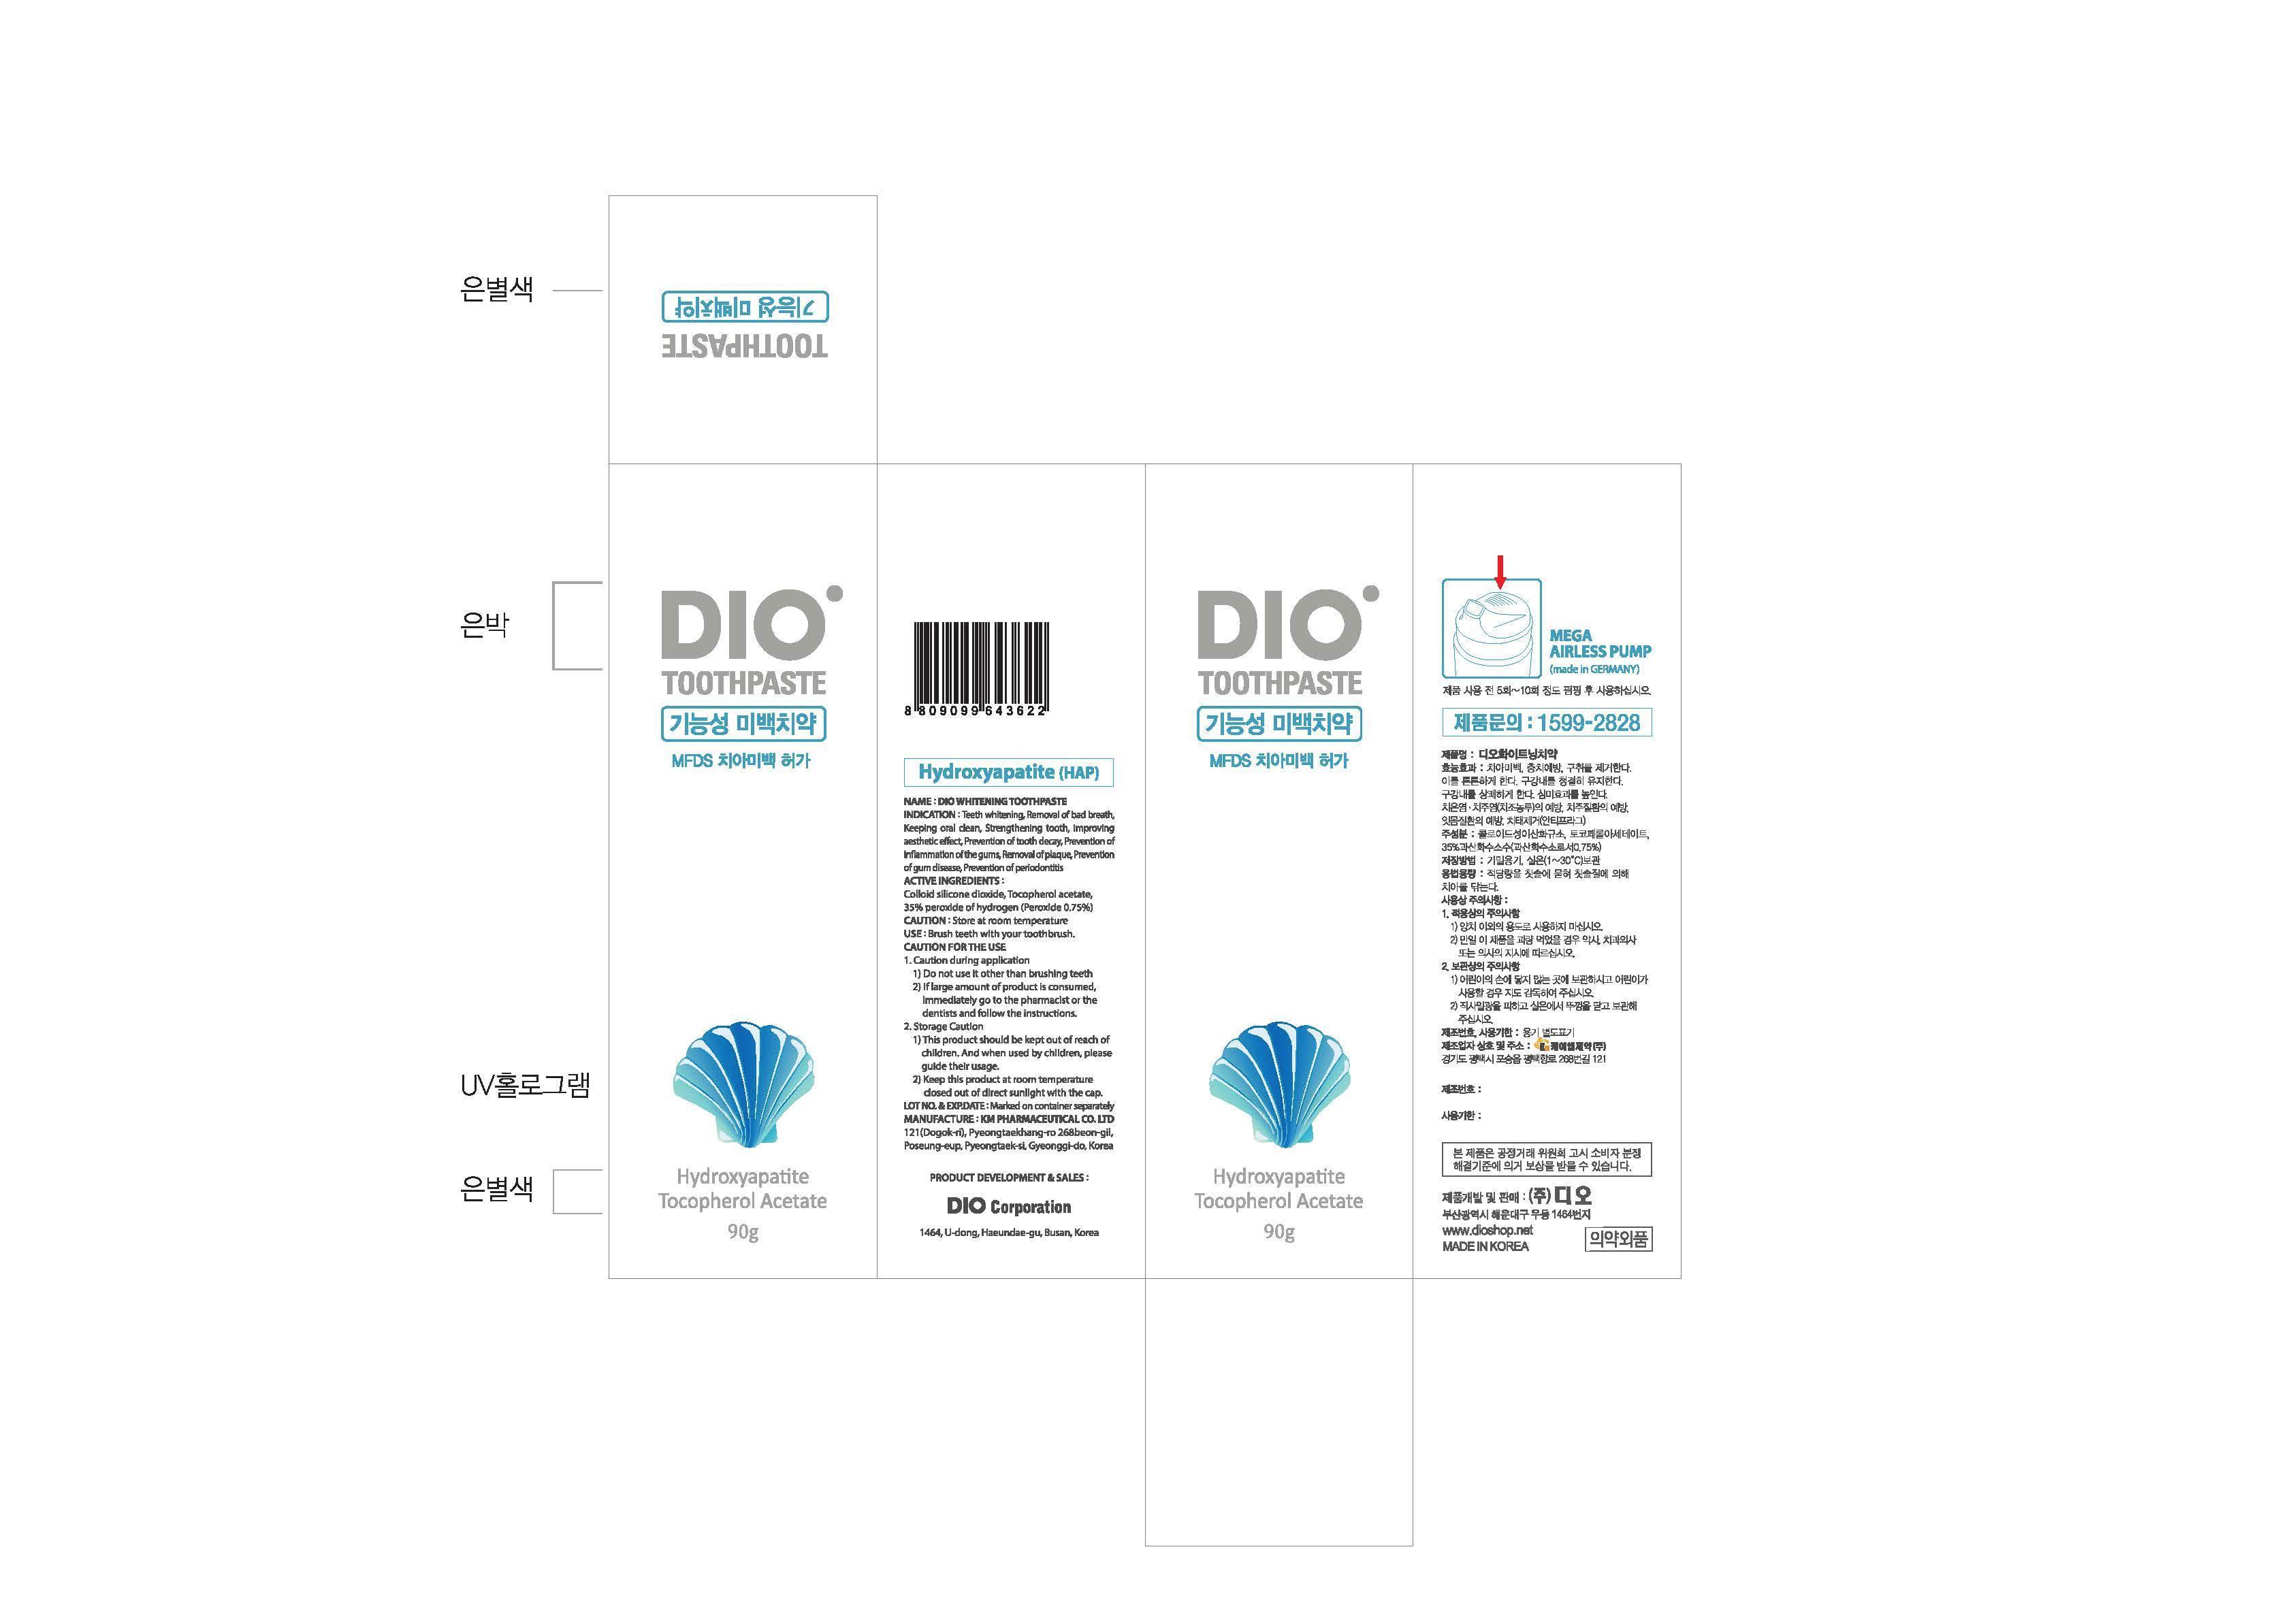 Dio Whitening (Sodium Fluoride) Paste, Dentifrice [Dio Corporation]